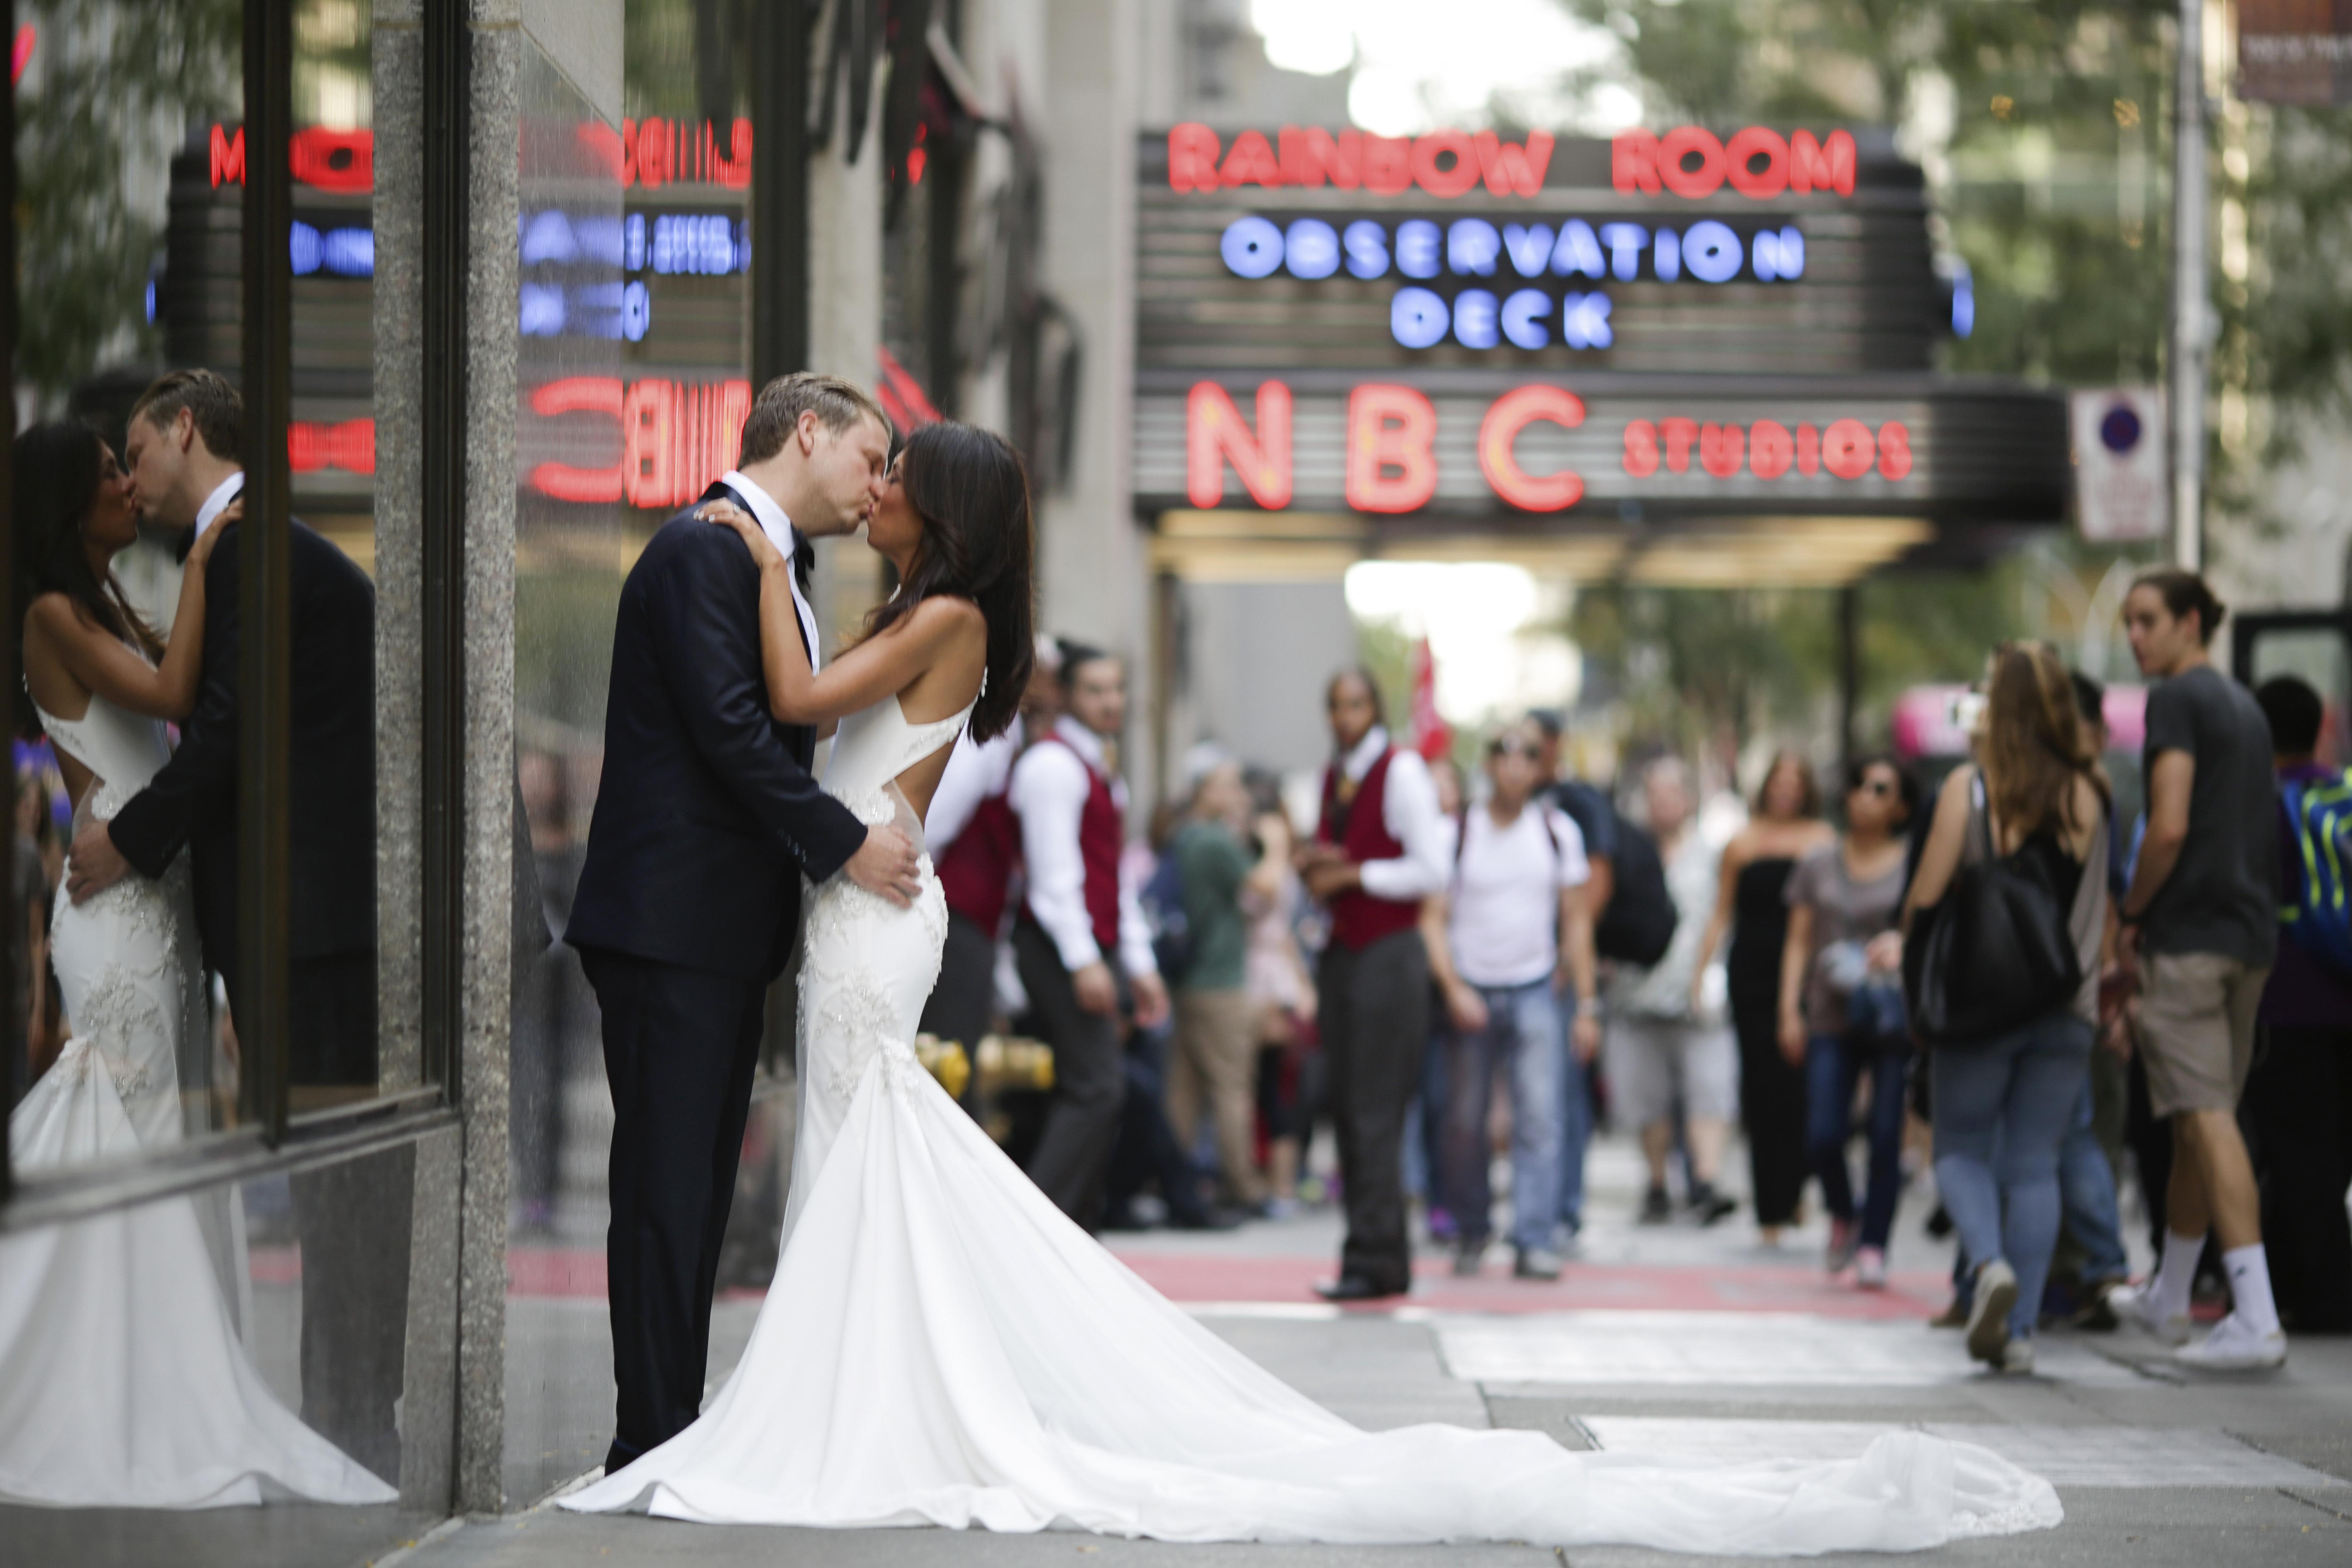 Gorgeous Wedding at the Rainbow Room - Anthony Vazquez Photography